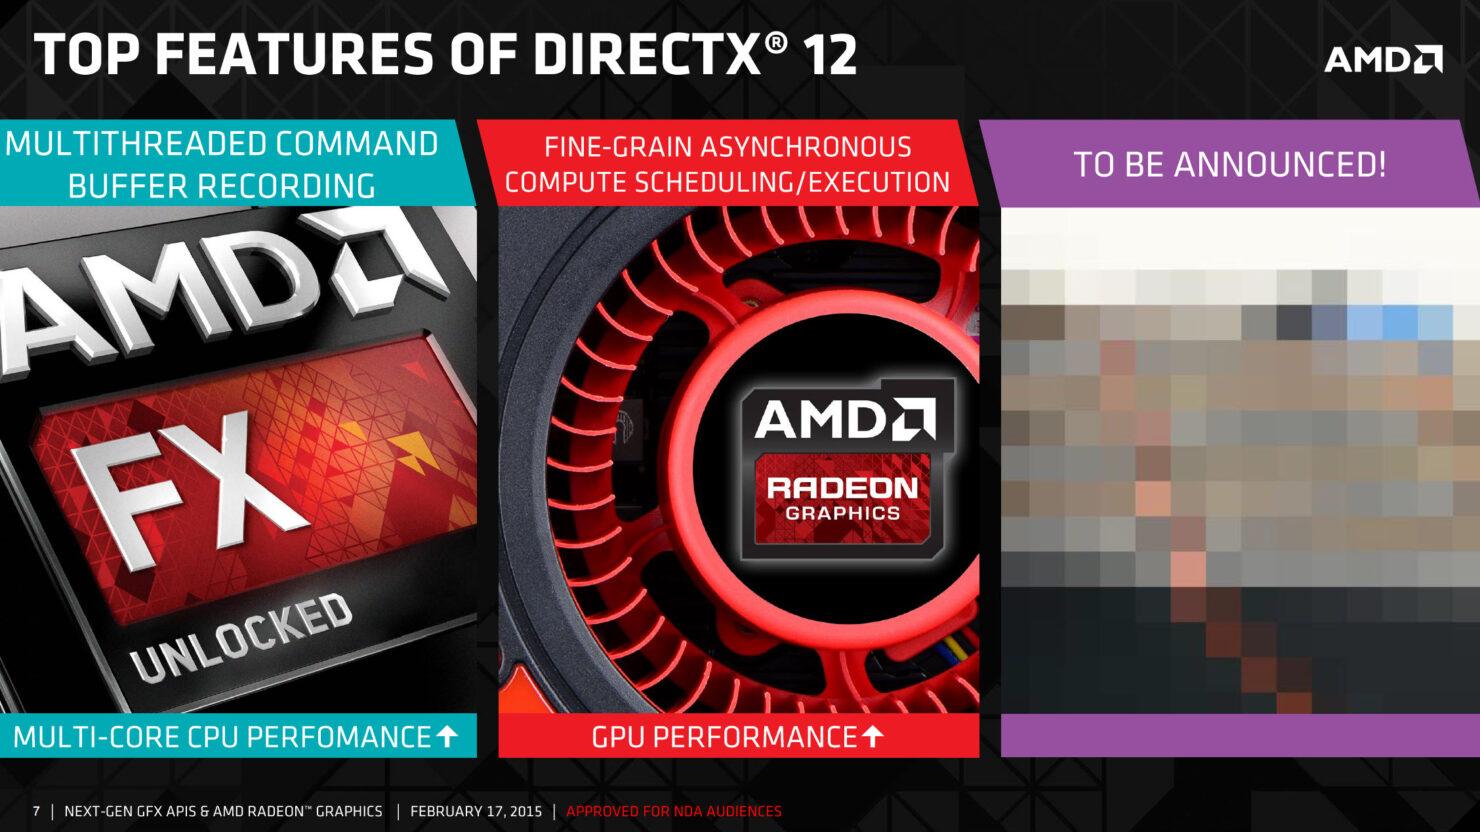 amd-directx-12-api-features